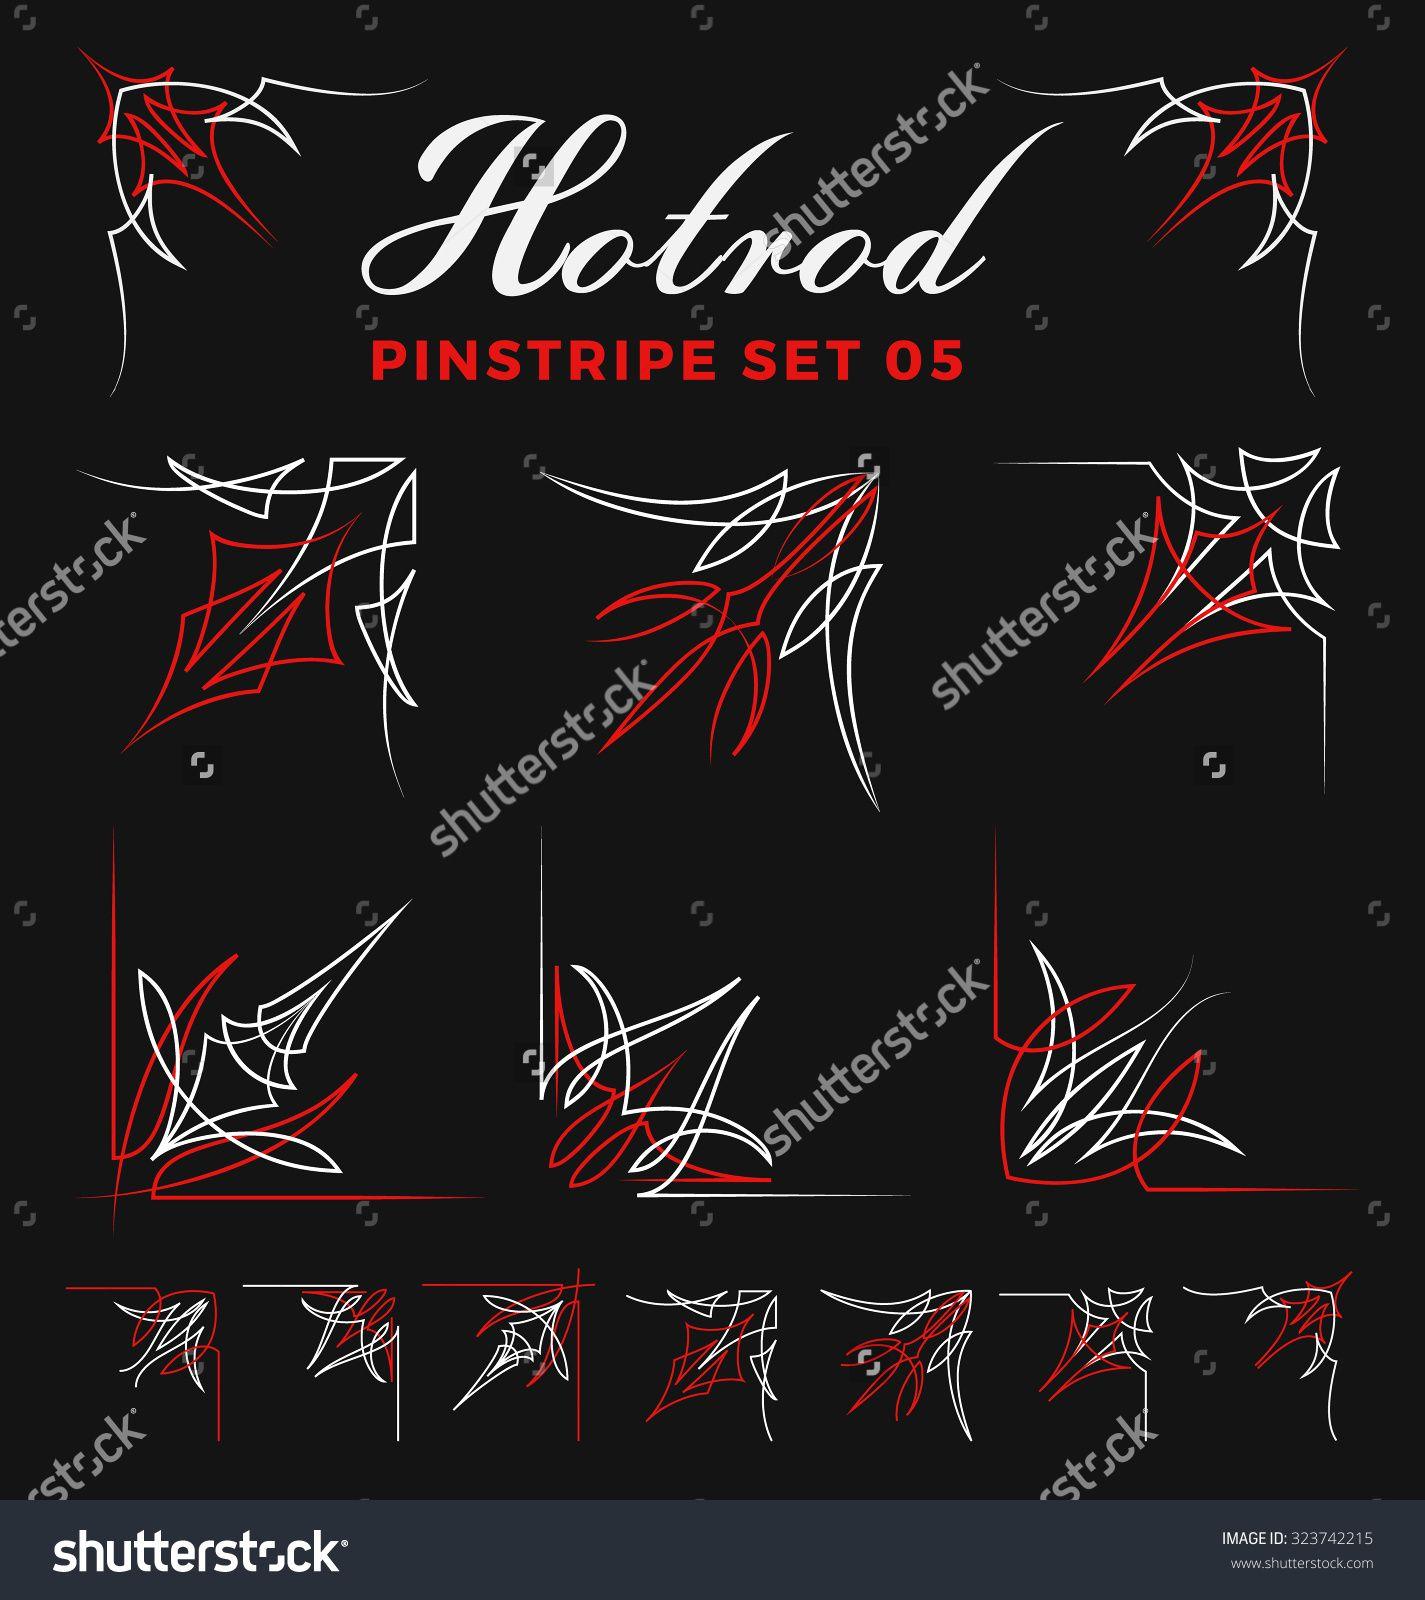 Set Of Vintage Pin Striping Corner Line Art Include Un